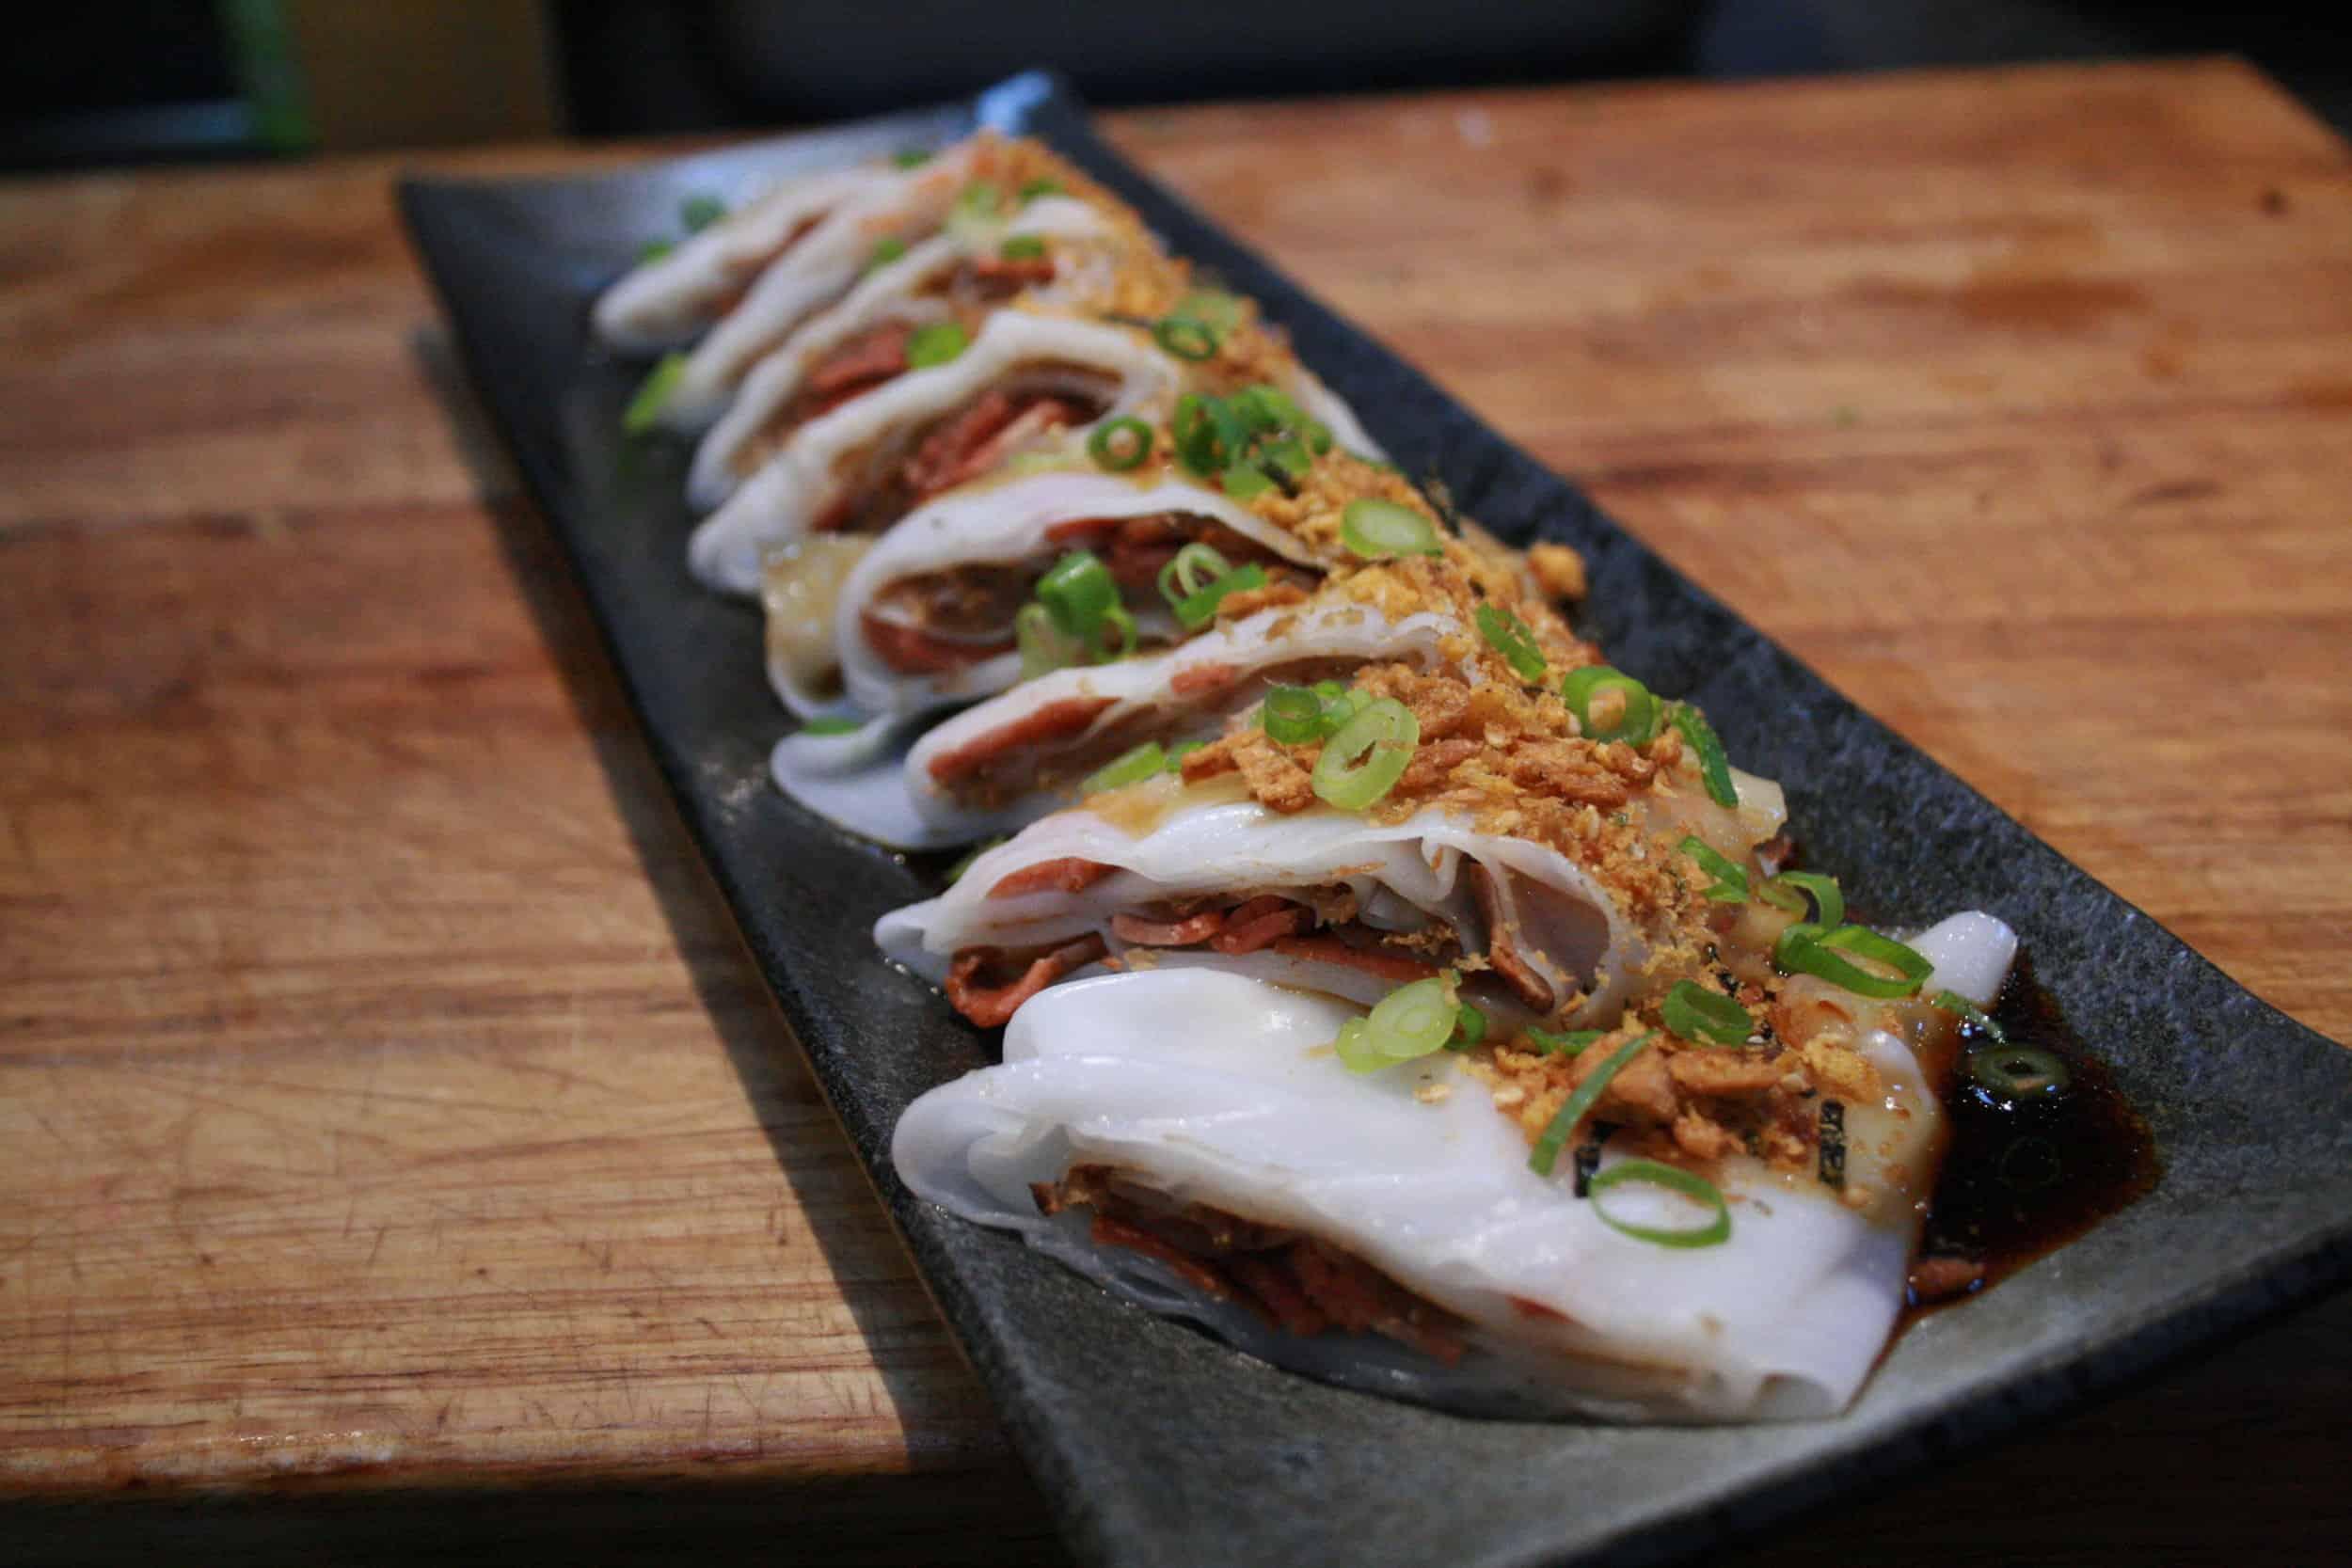 A rectangular plate of vegan dumplings.